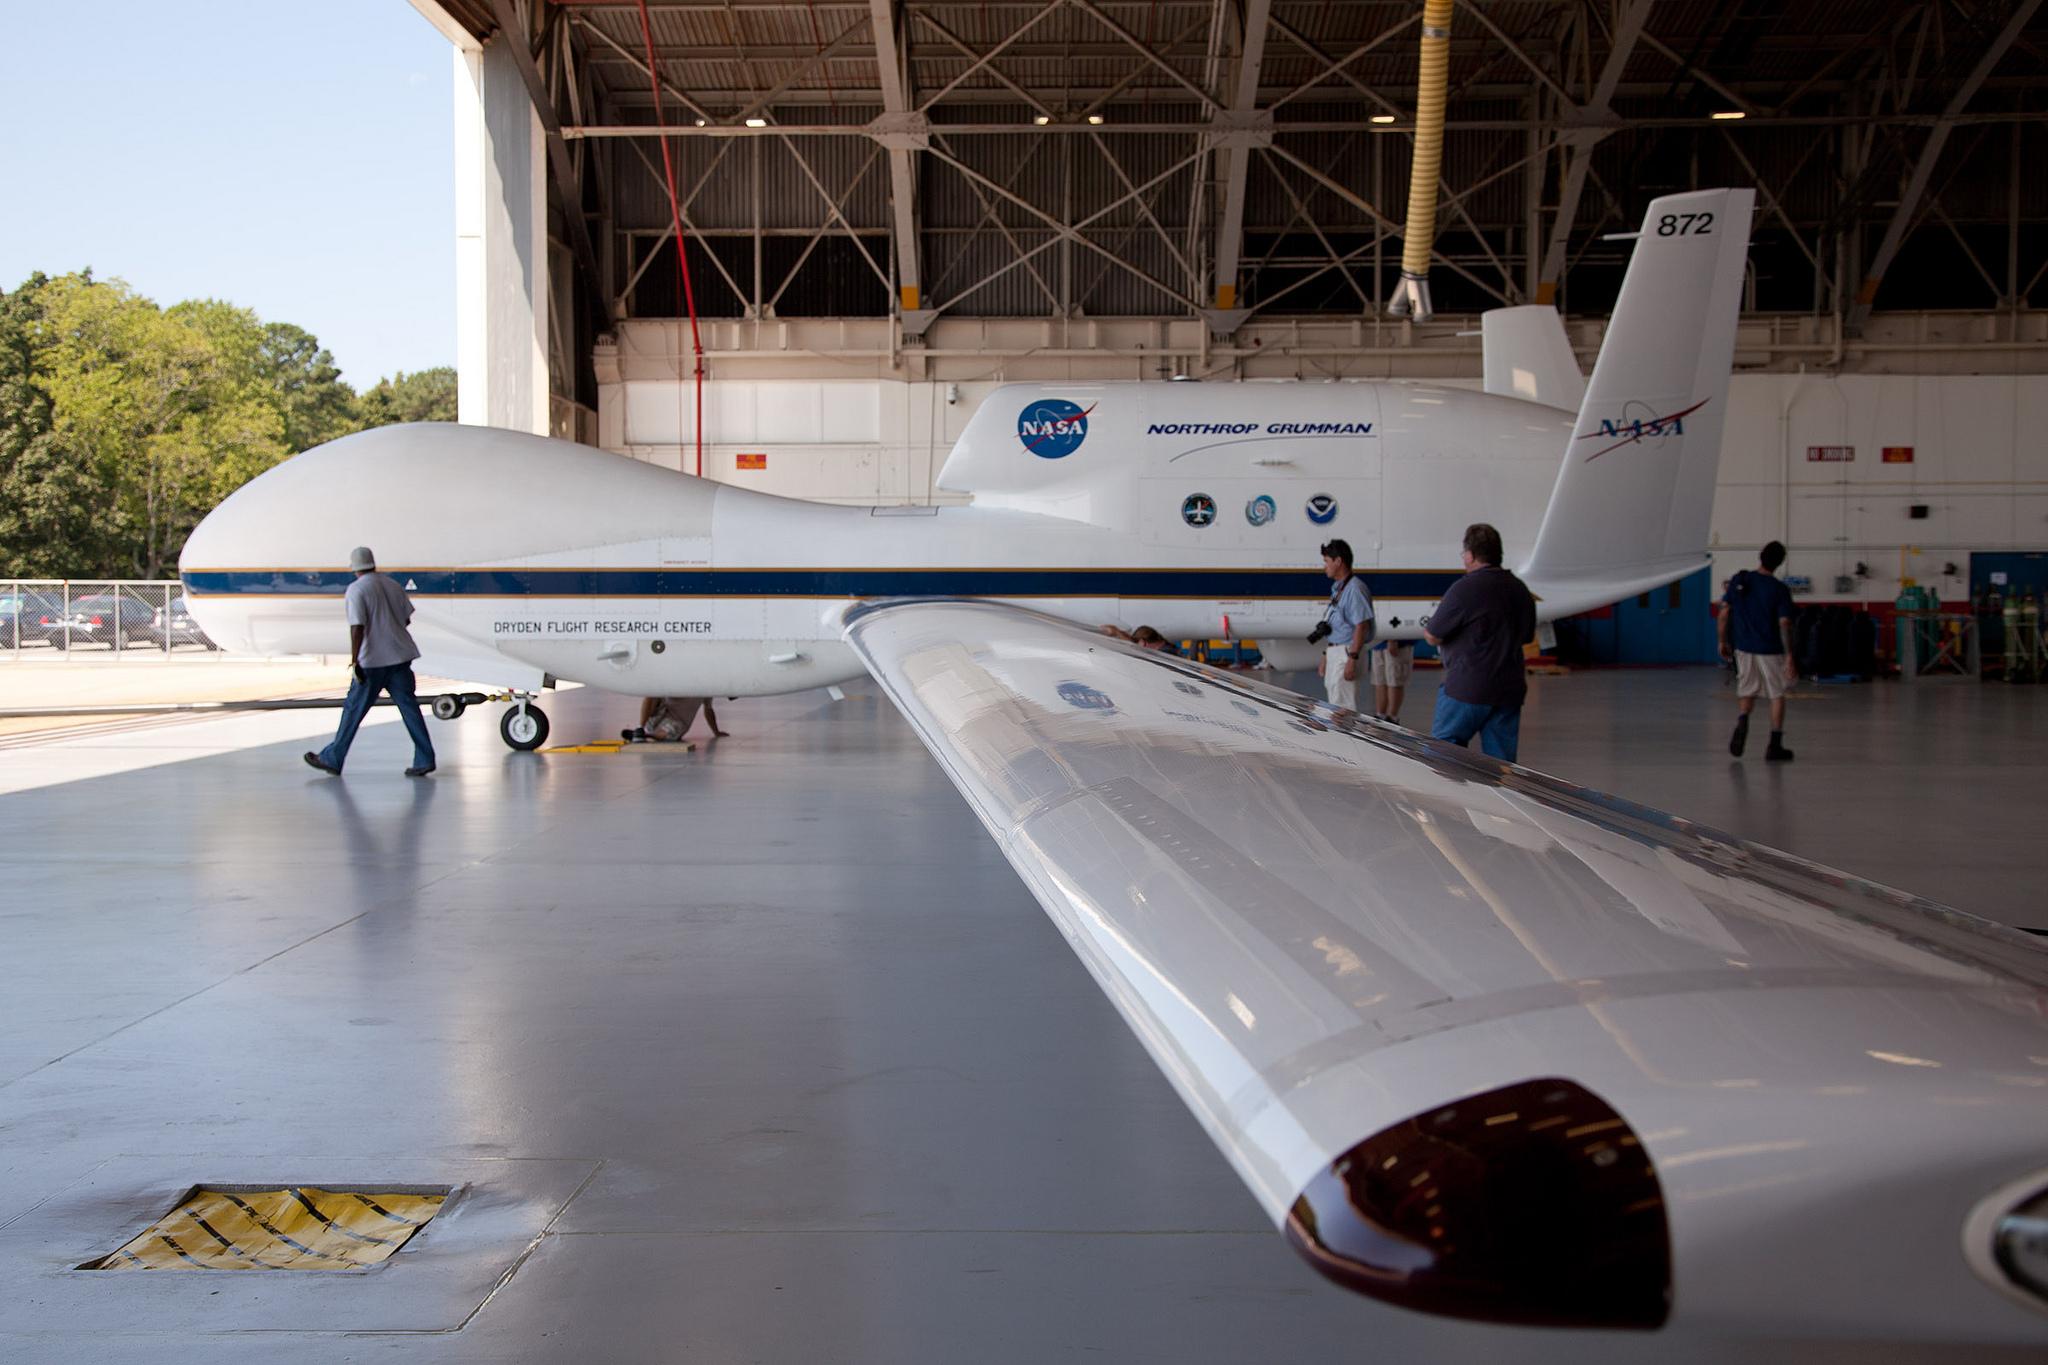 Global Hawk To Provide Target Fix Track Essment Using A New Broad Area Sensor